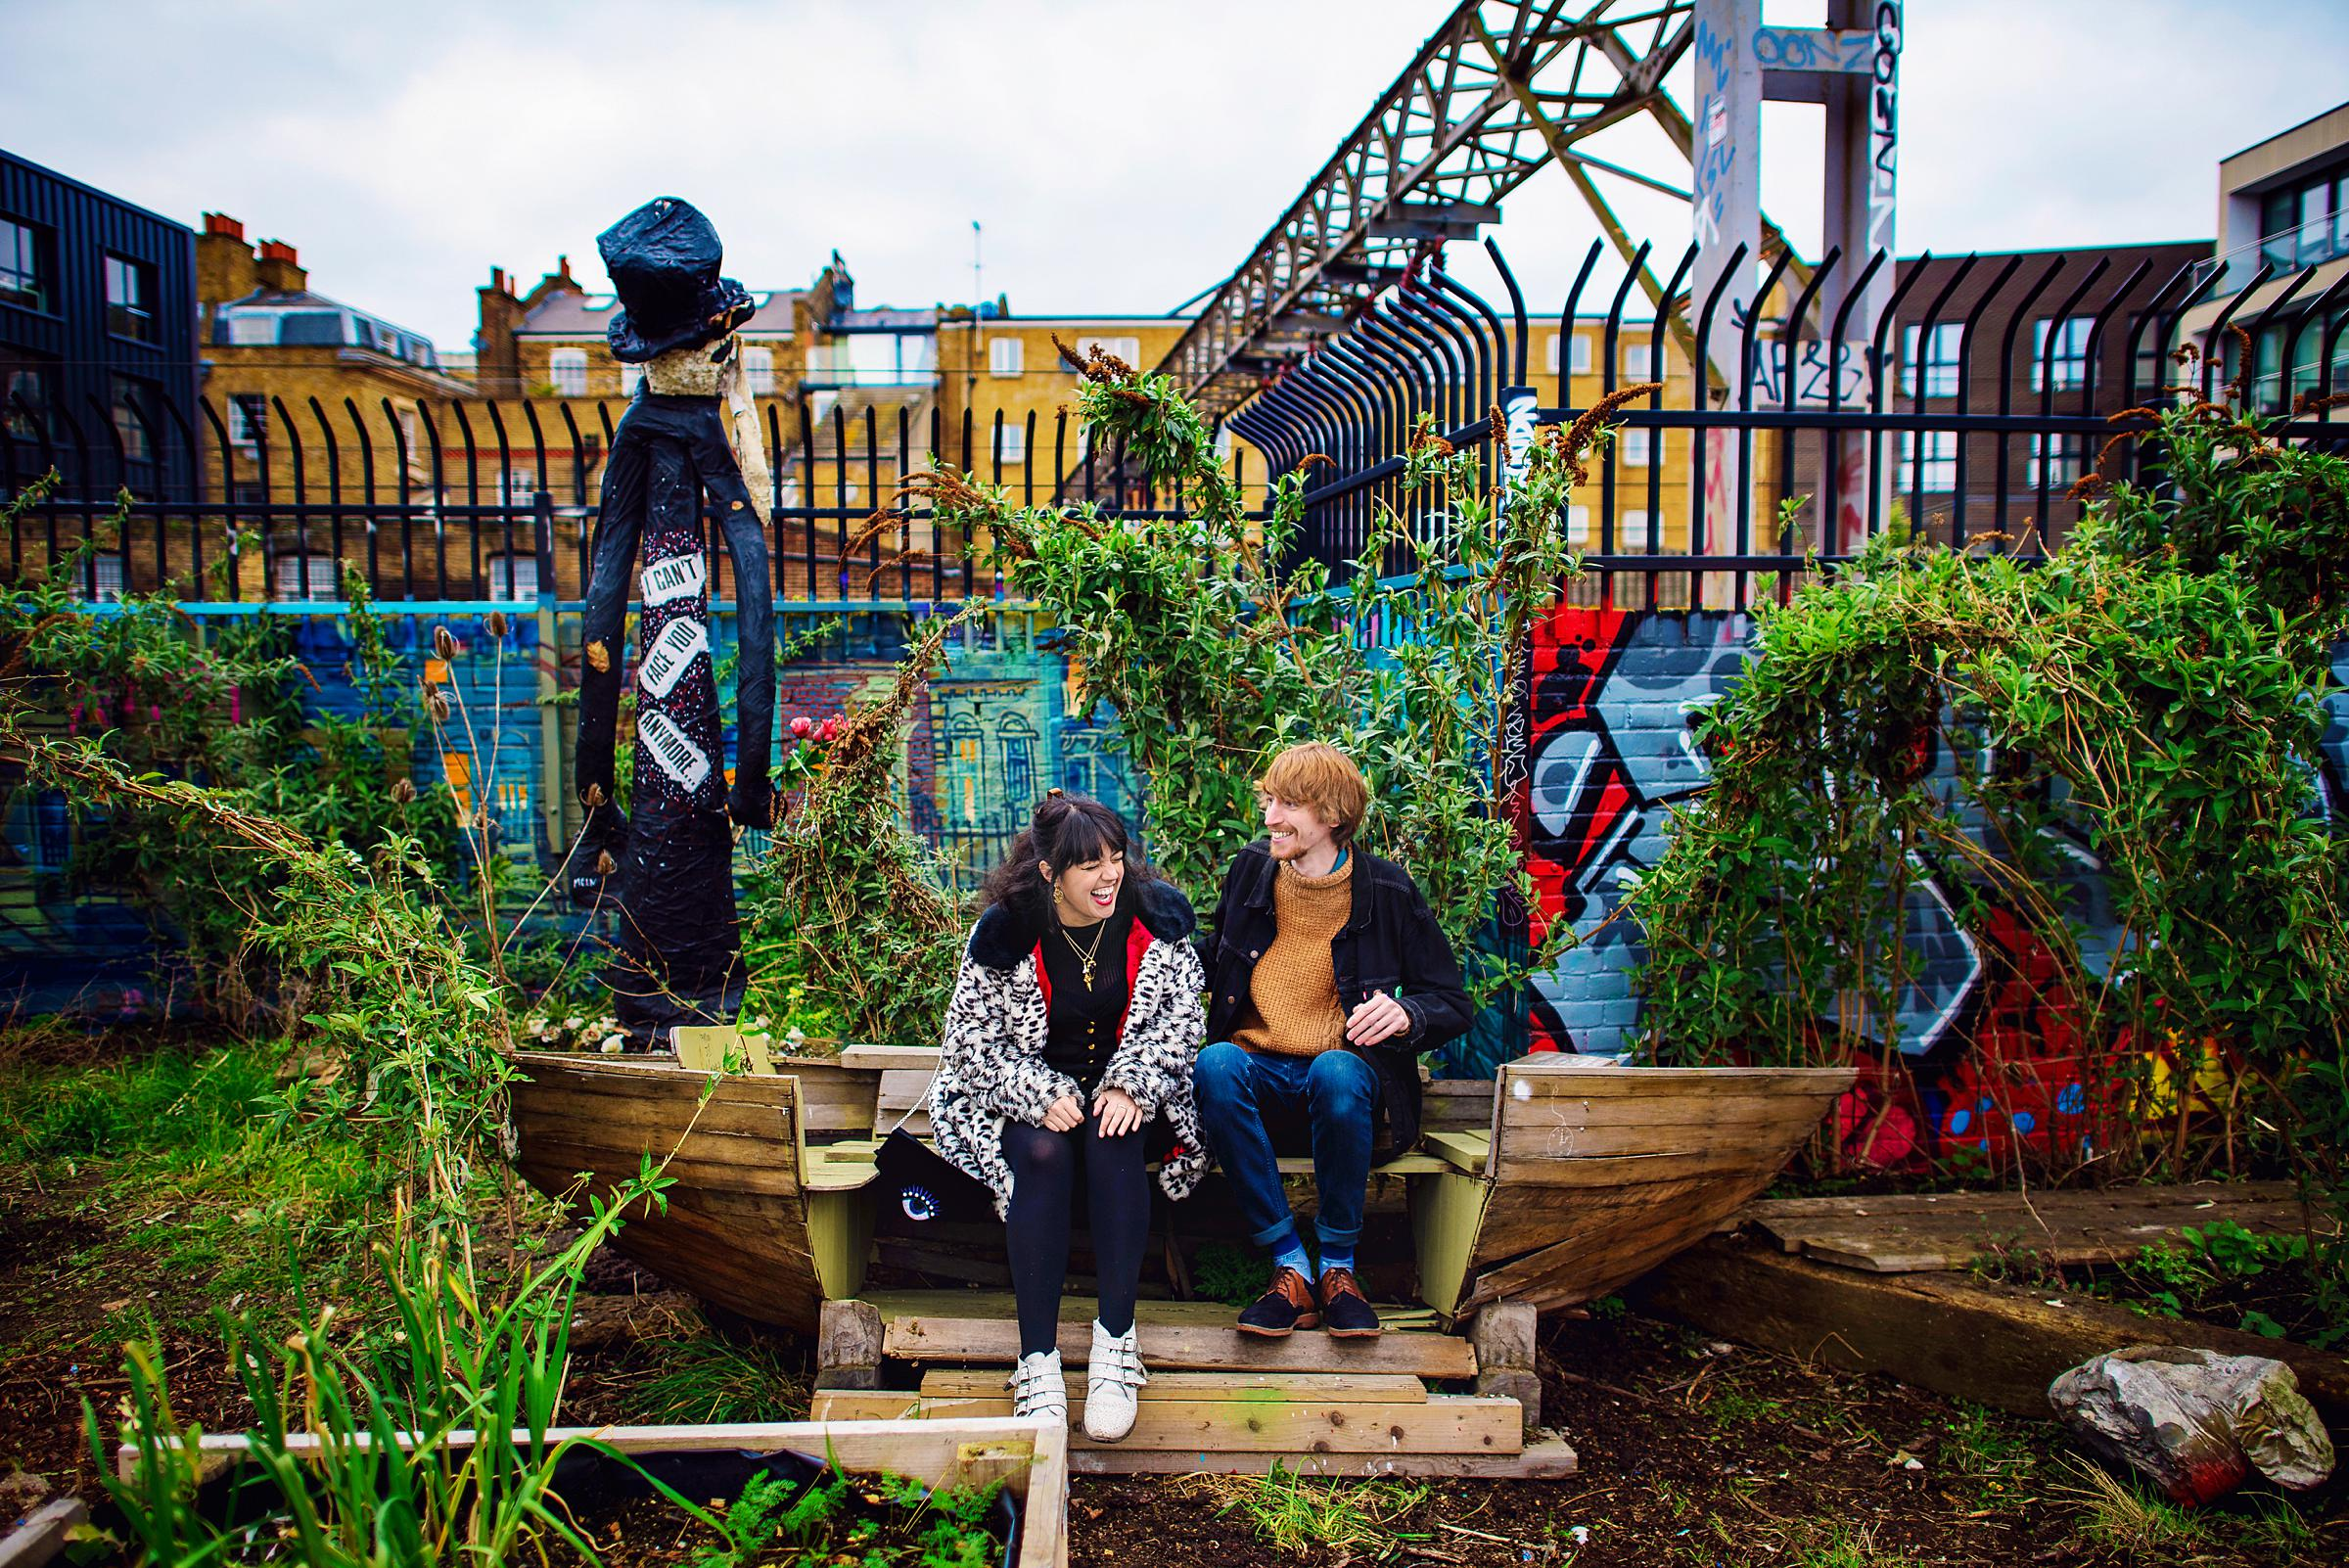 Brick Lane Engagement Session - Shoreditch - Photography by Vicki